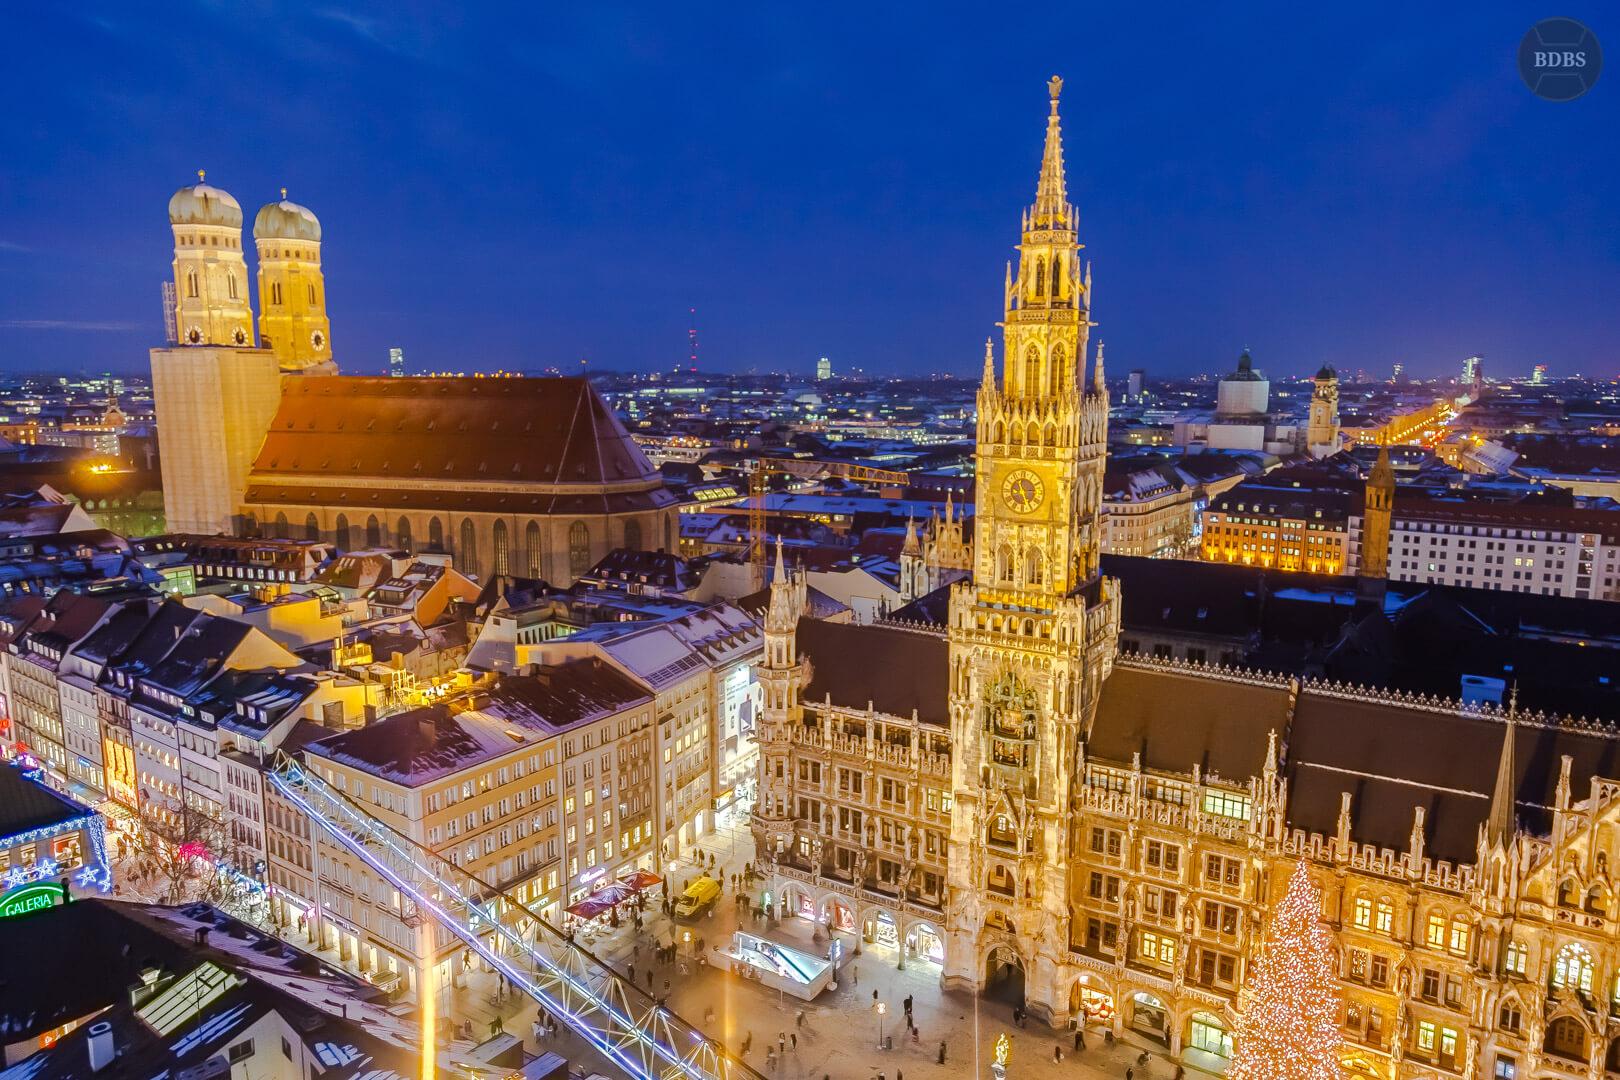 Skyline München Blick vom Alten Peter HDR (1/20 Sek - f,4,0 - 24mm - ISO1000)